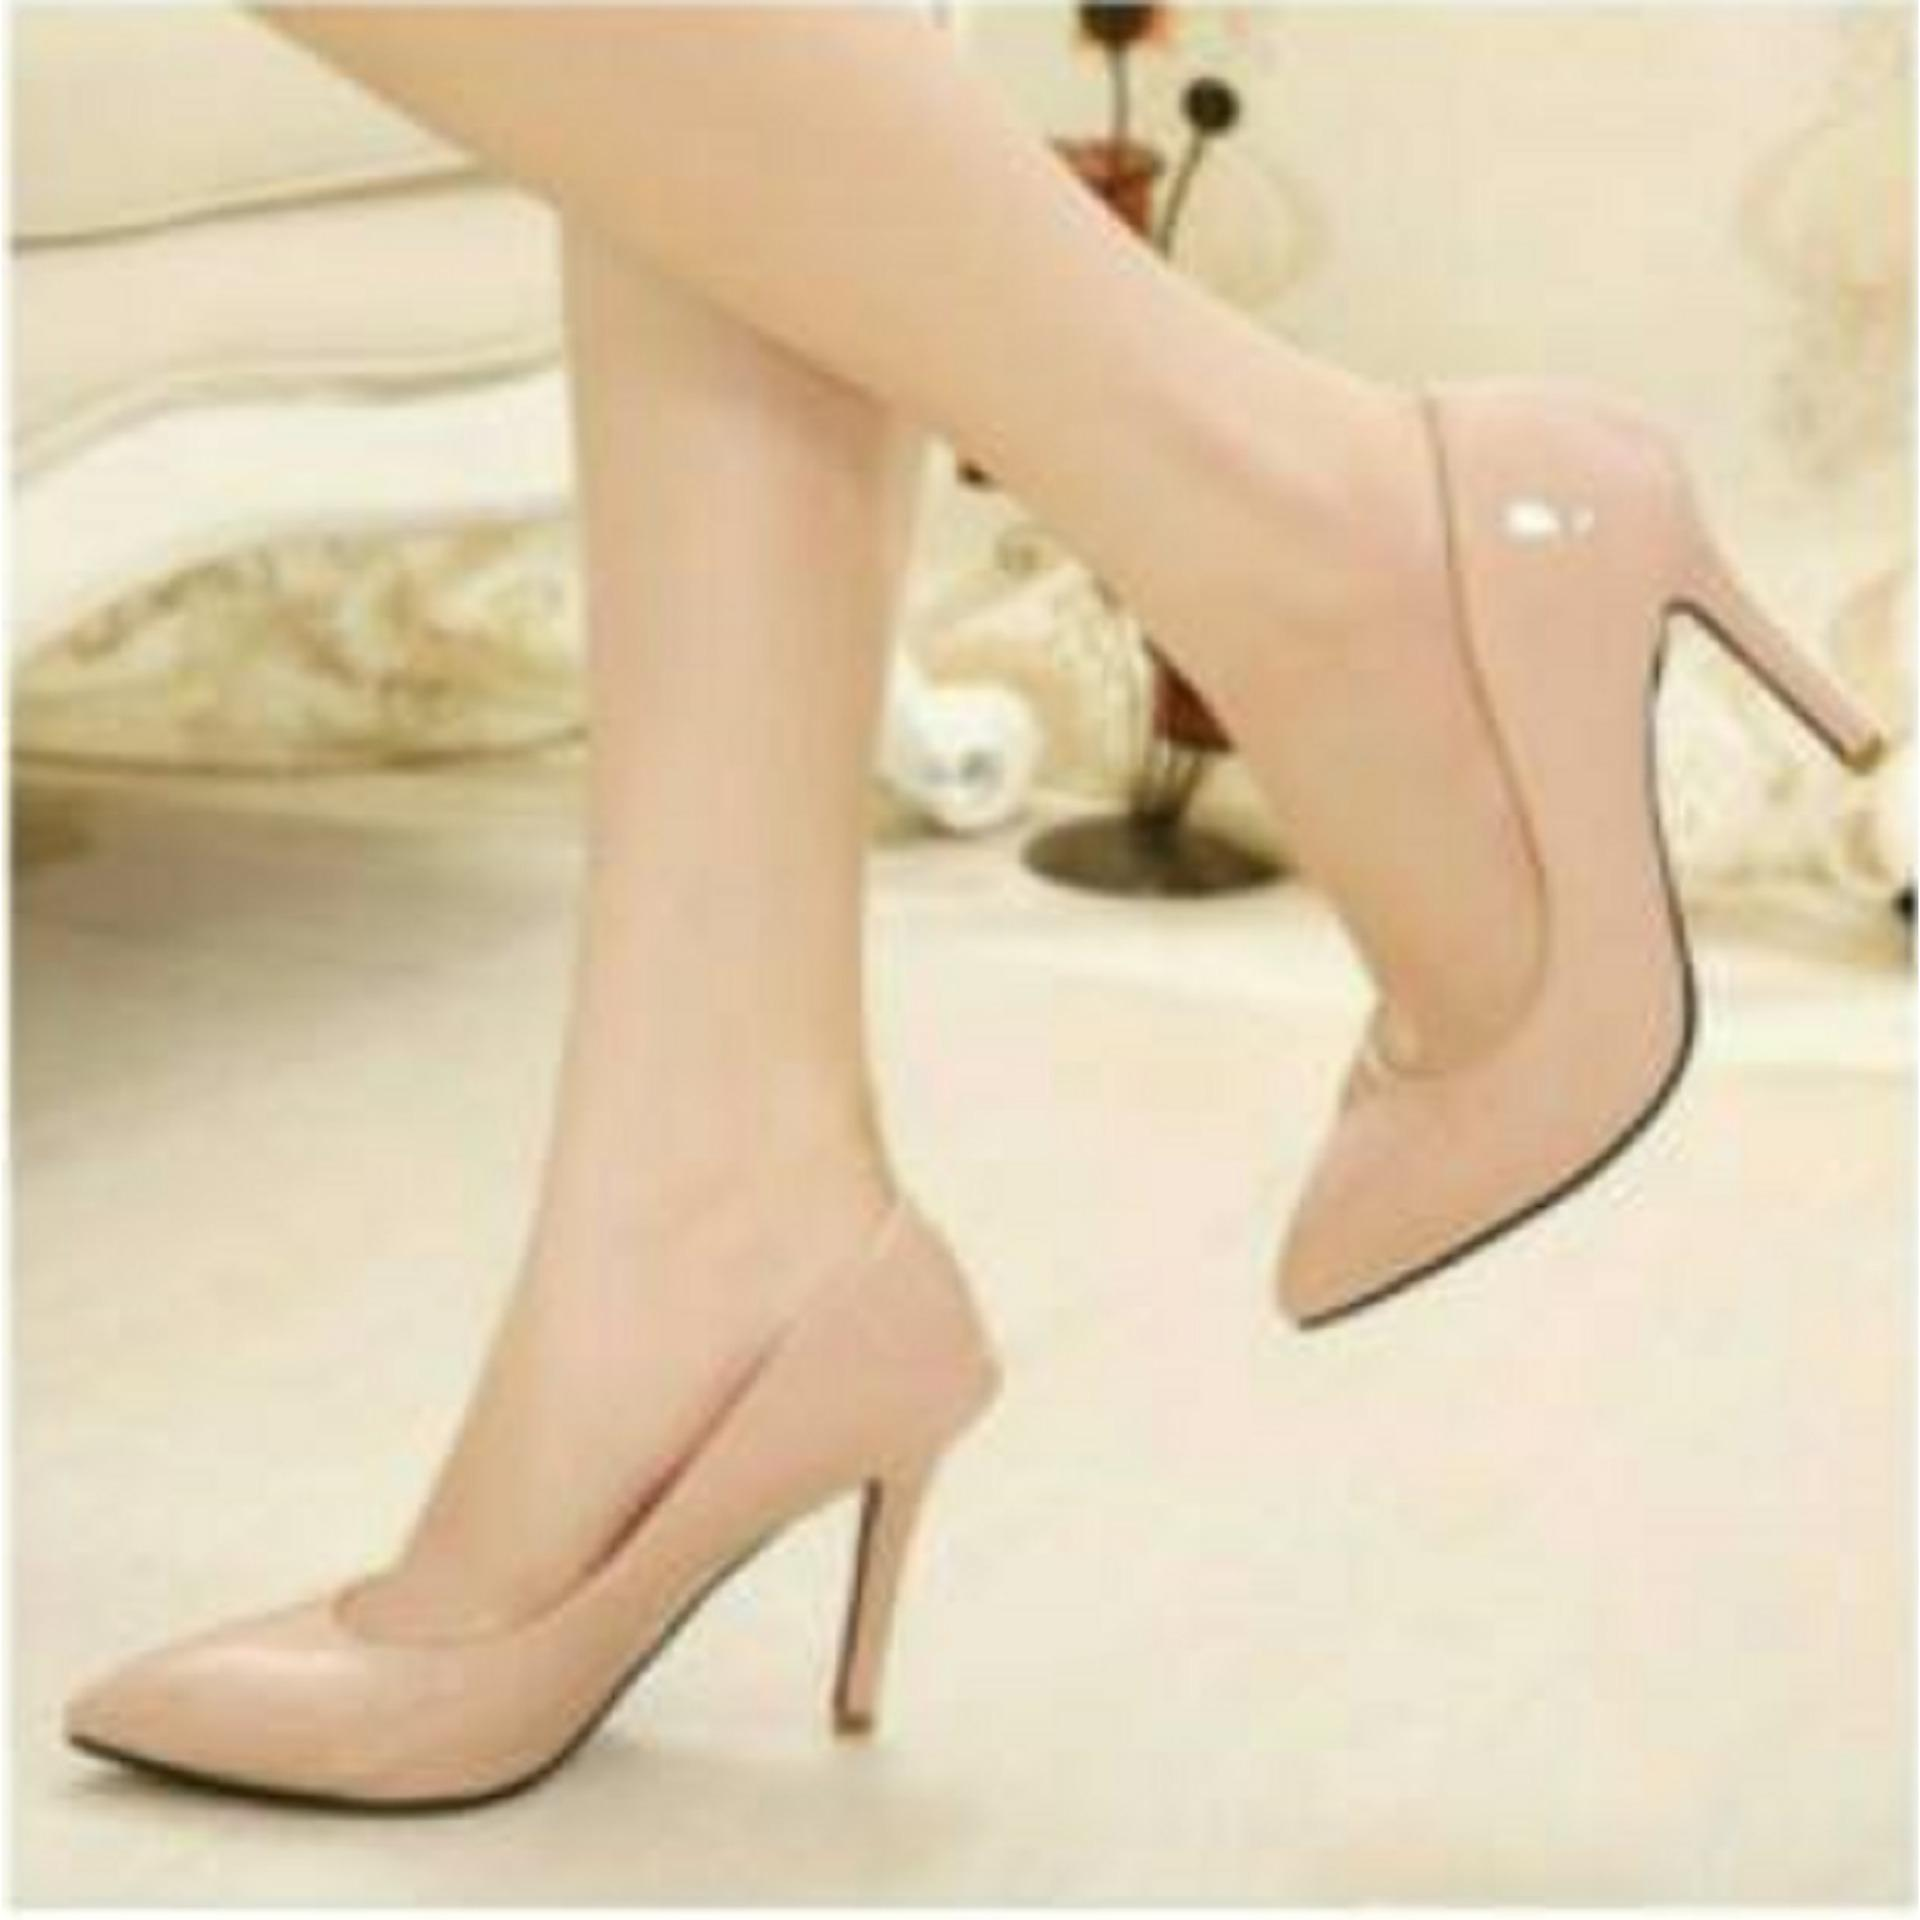 Sepatuafa - High Heels Sepatu Kerja Wanita Pesta Glossy Pantopel OG09